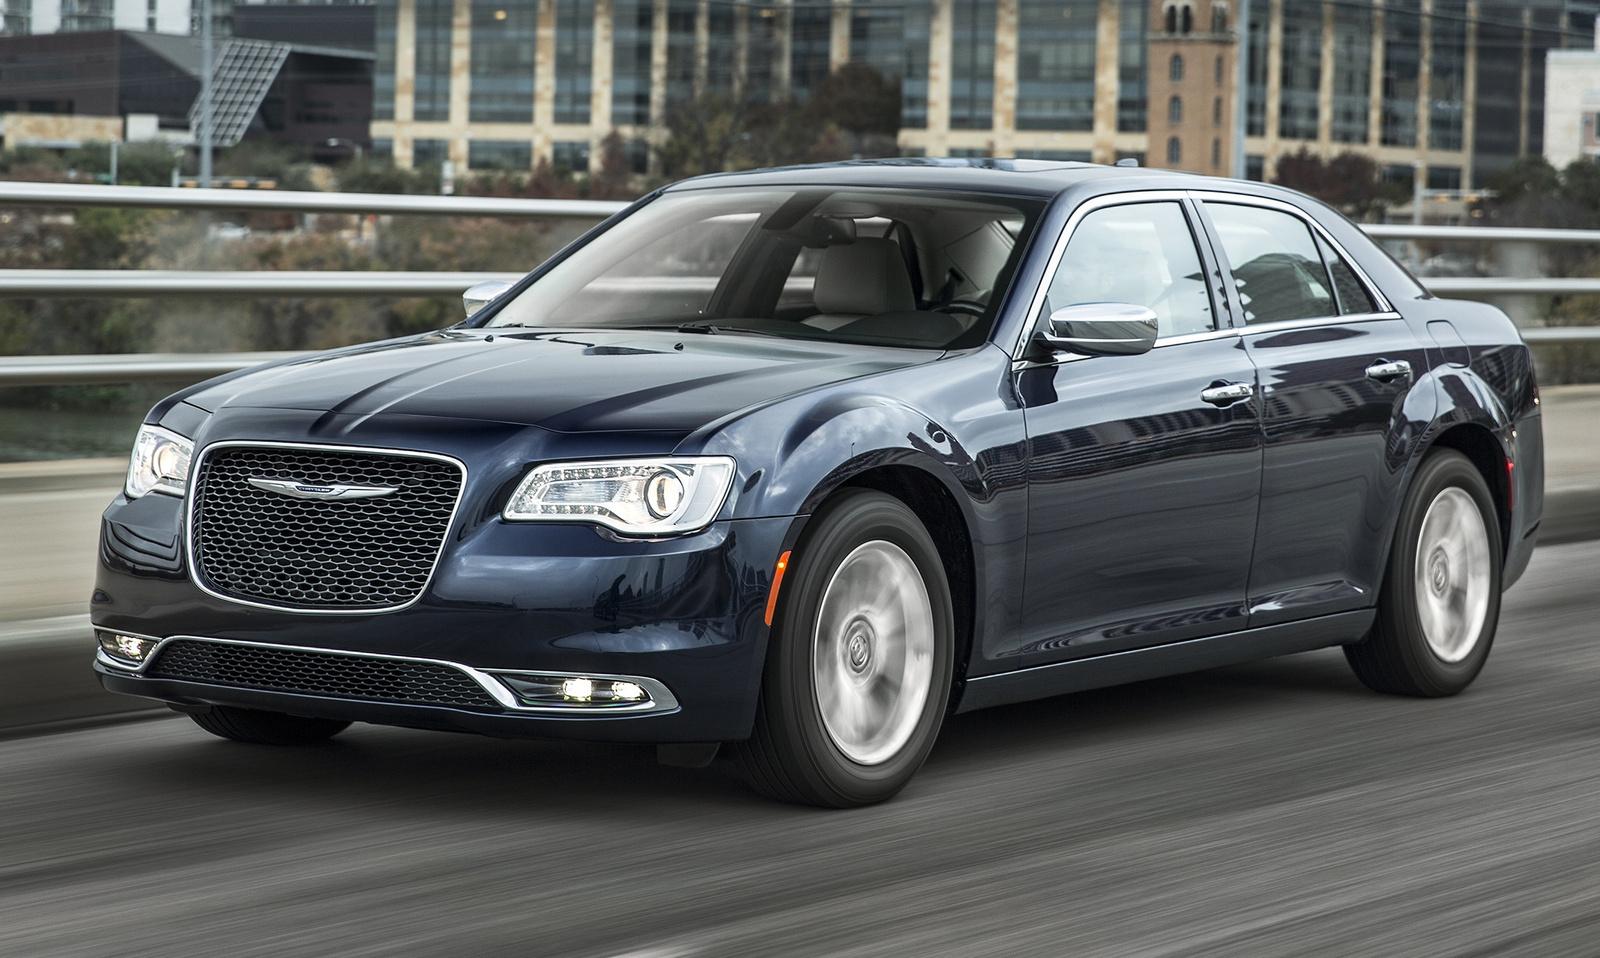 2016 Chrysler Imperial >> Chrysler Autopedia Fandom Powered By Wikia